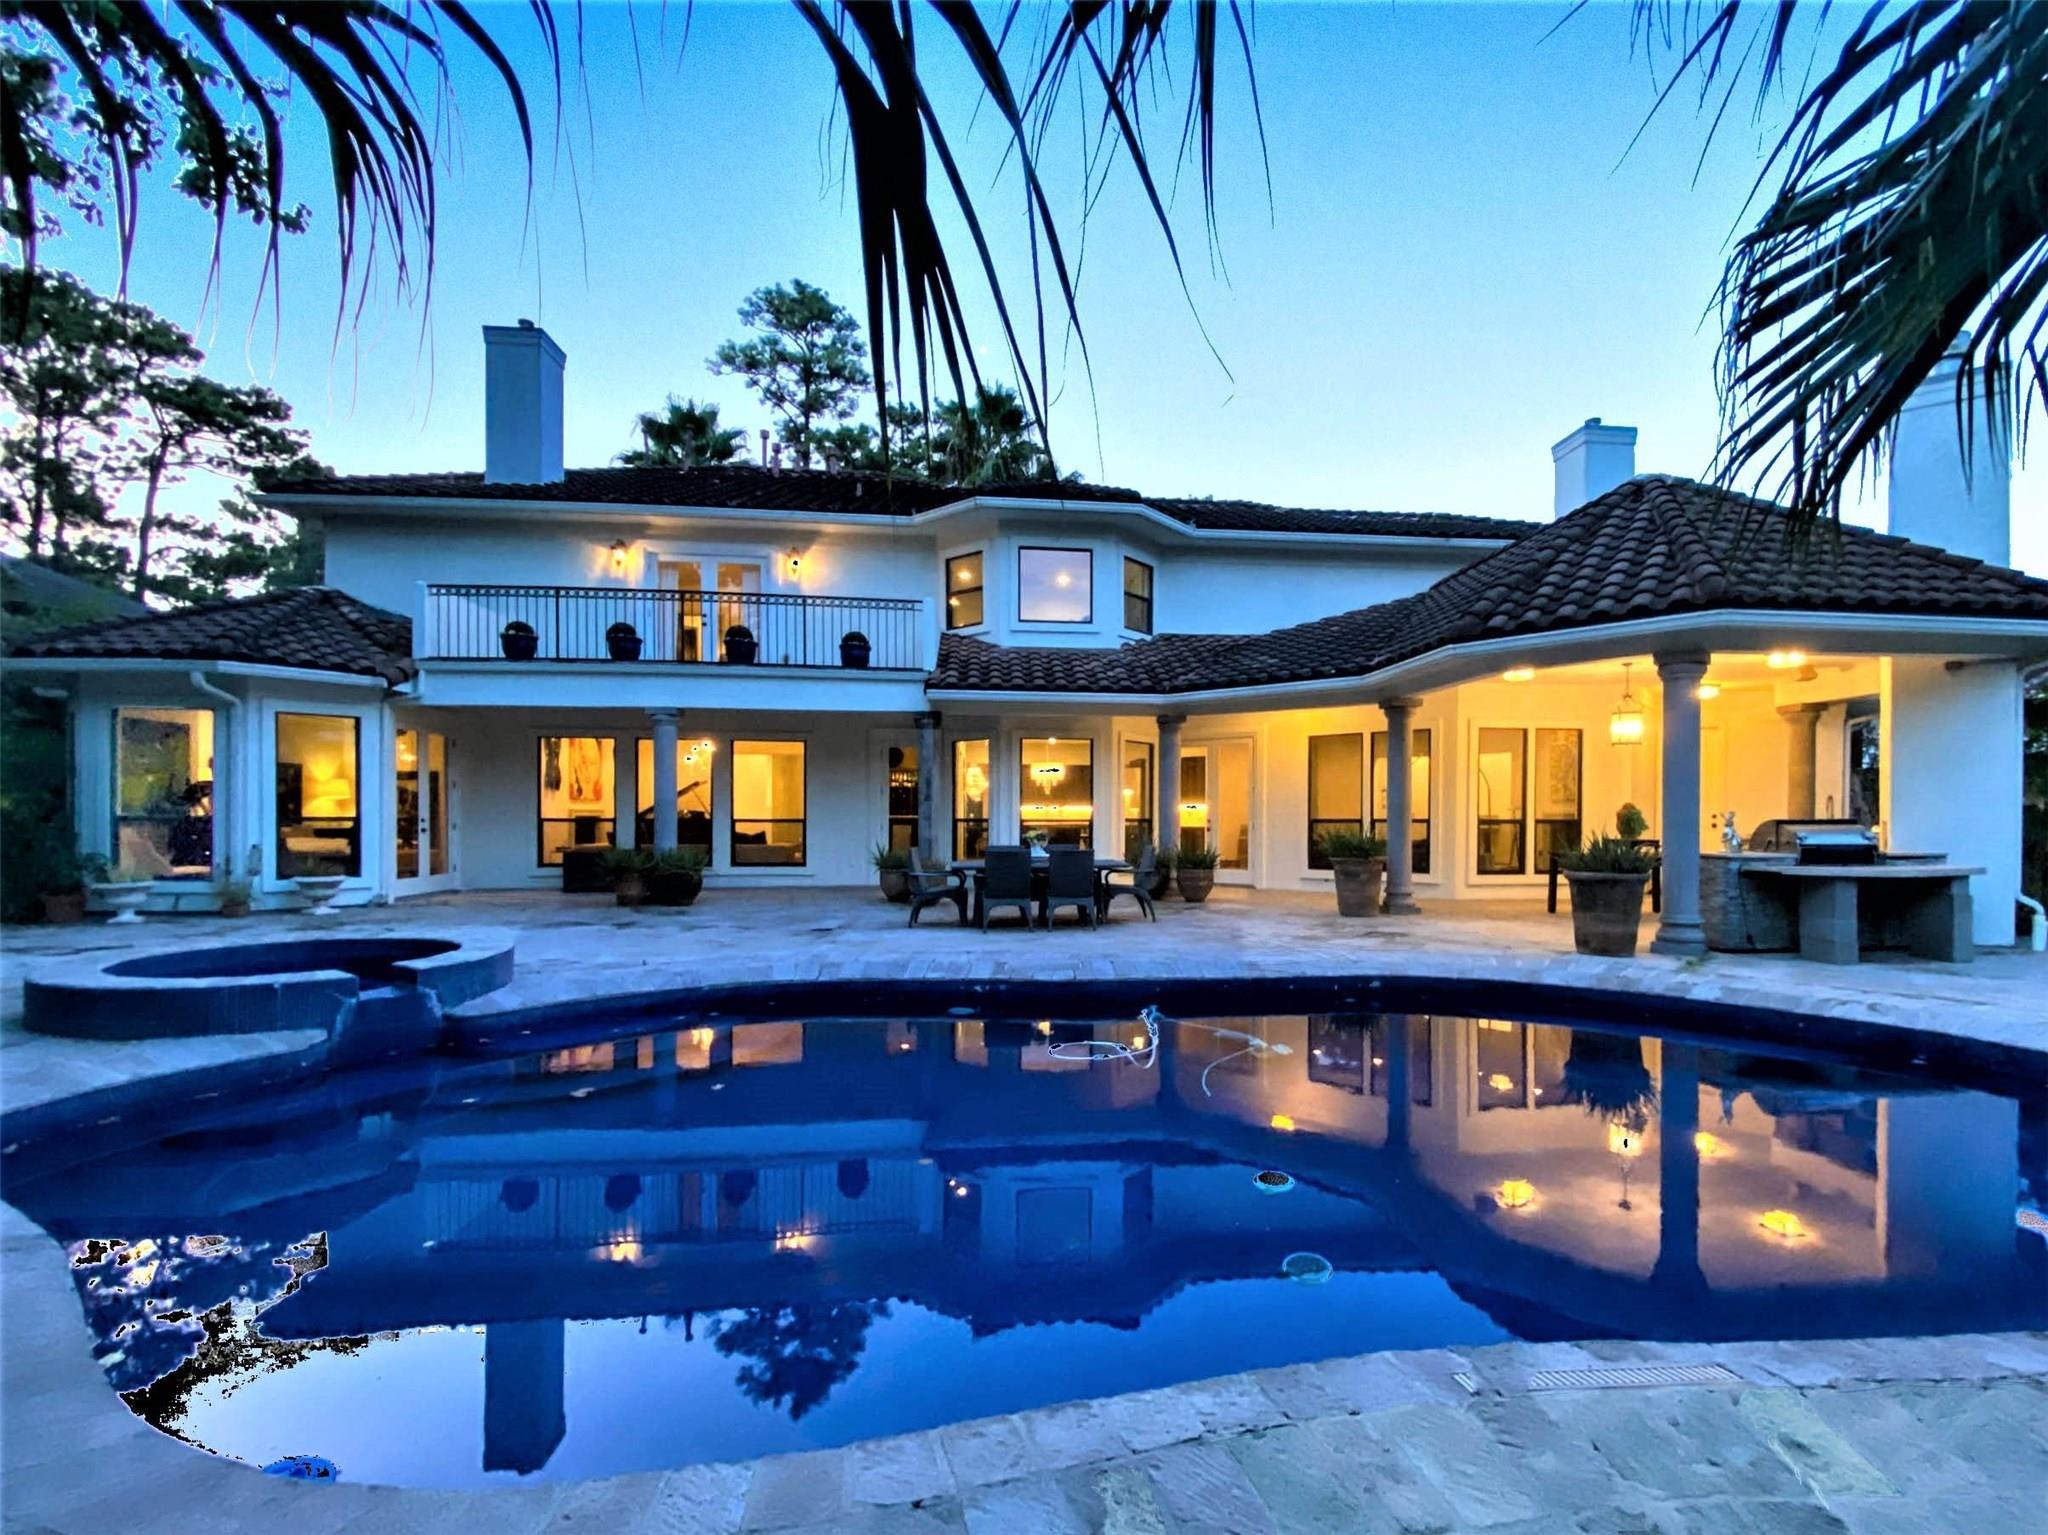 33 E Shady Lane #B Property Photo - Houston, TX real estate listing